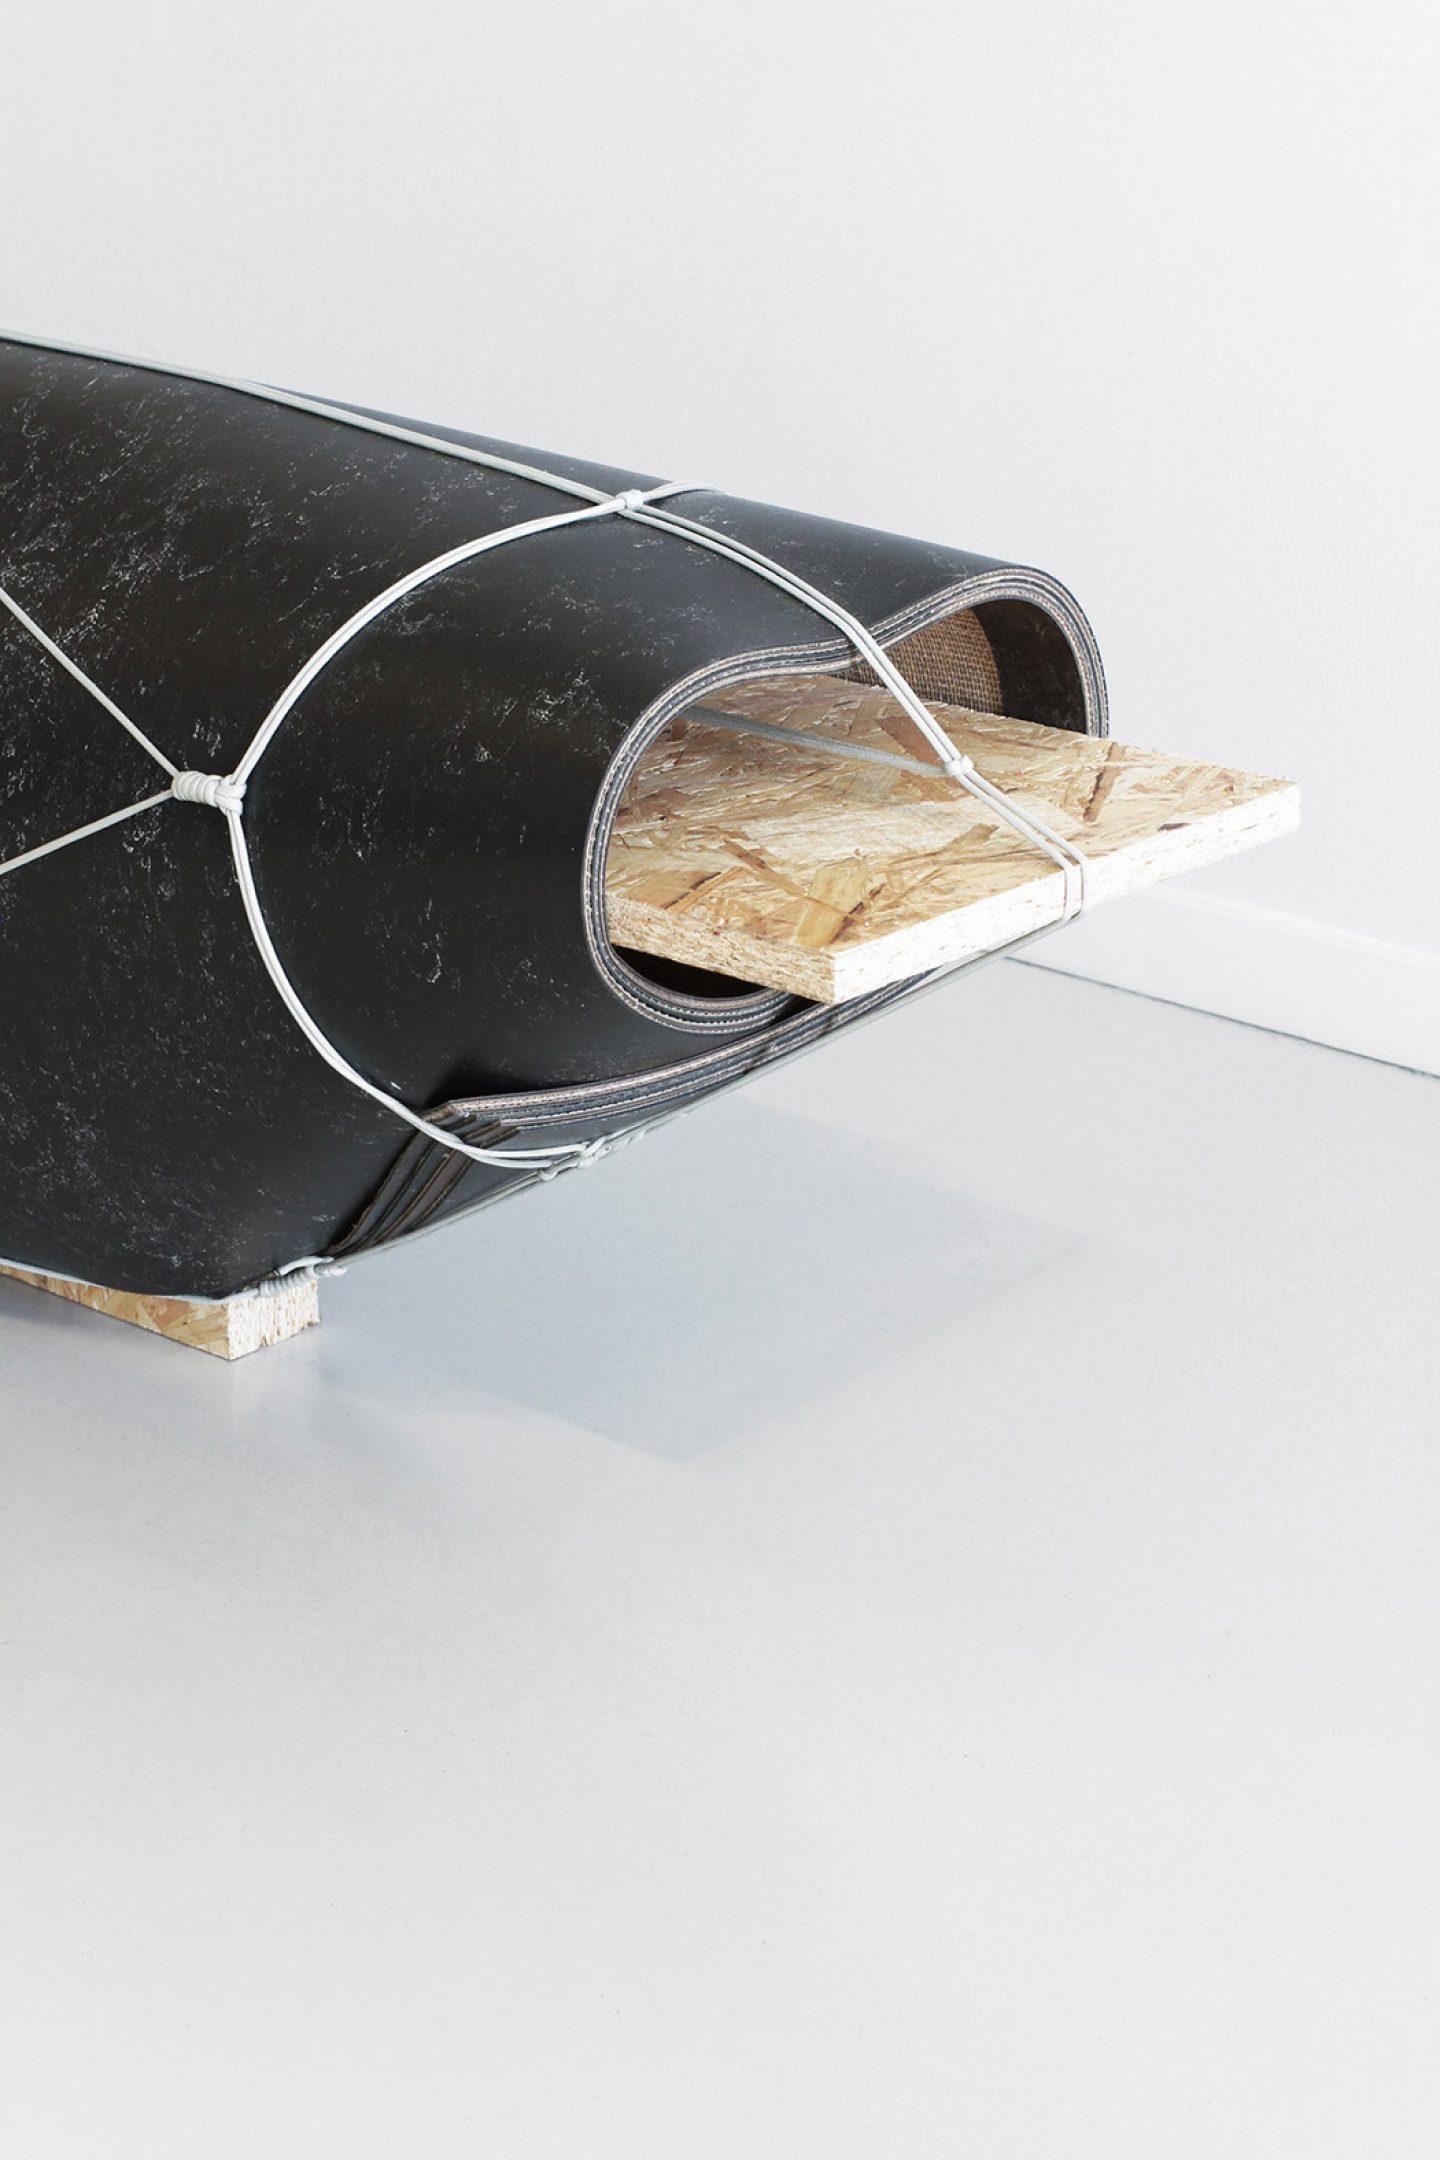 iGNANT_Design_Maarten_Kolk_Guus_Kusters_Bound_Stool_Bound_Bench_8